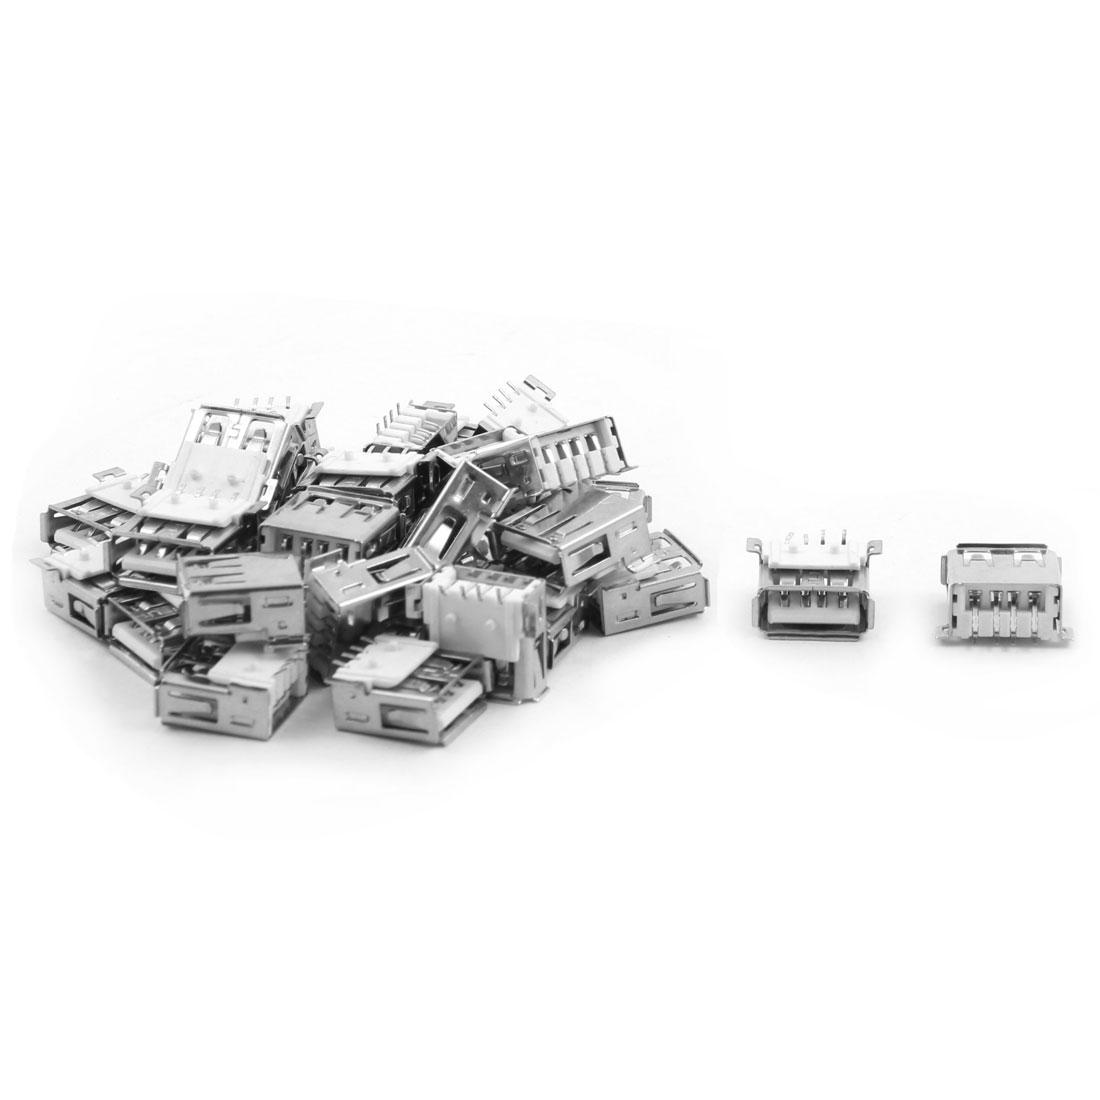 DIY Craft USB 2.0 Port Type A 4 Pin Female Socket Connectors 30pcs for PCB